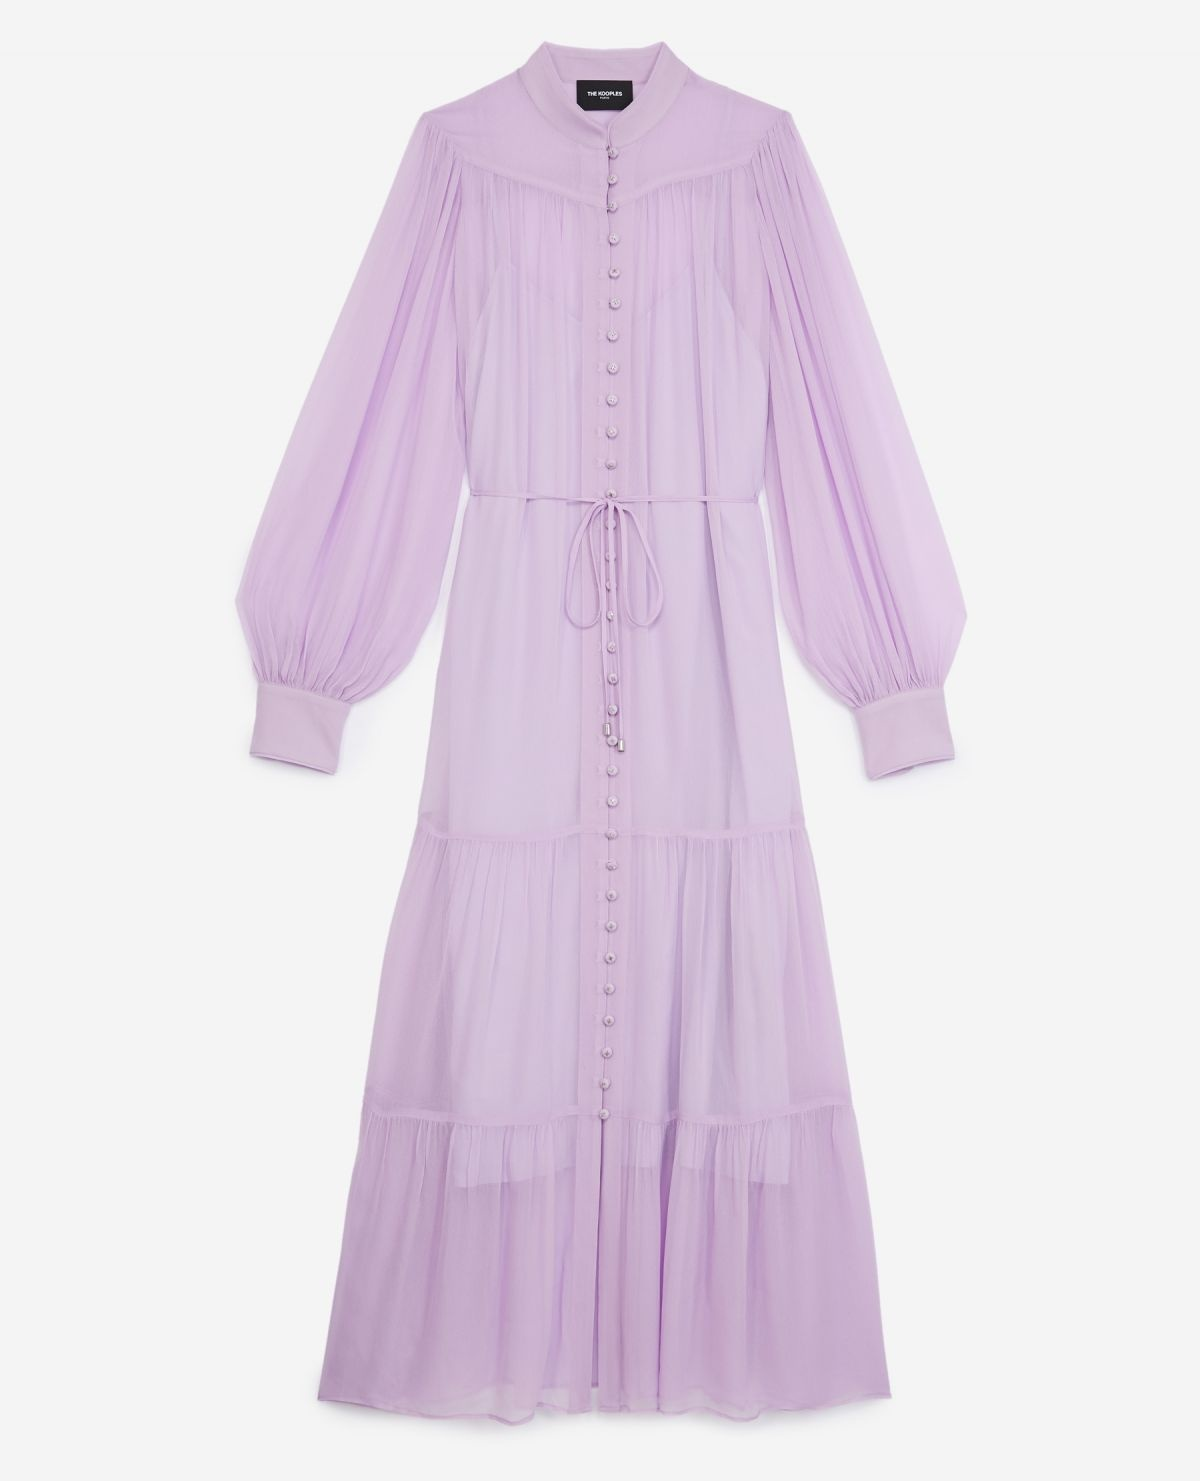 THE KOOPLES robe longue ceinturee-1